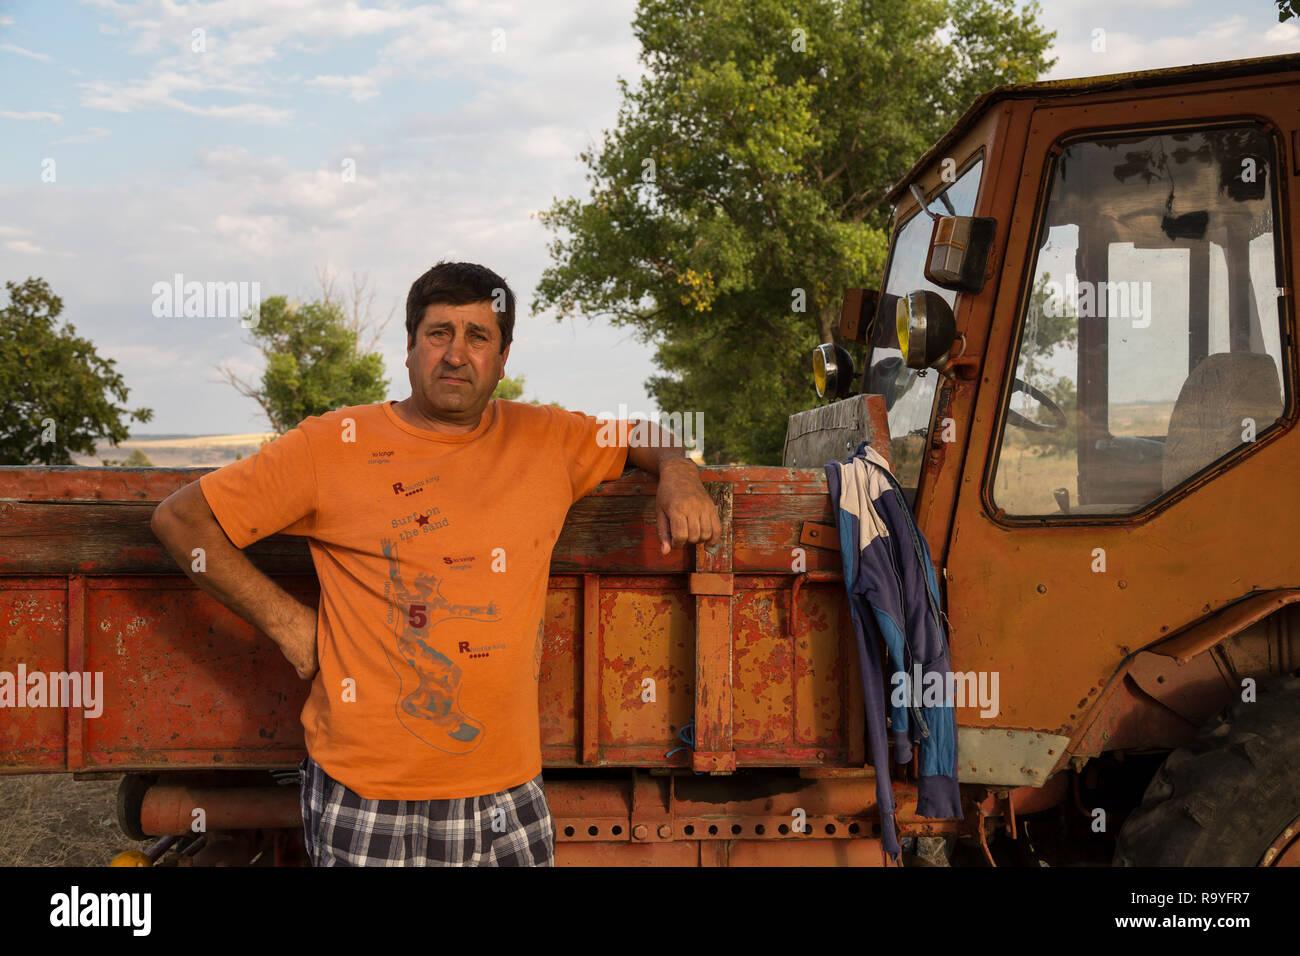 30.08.2016, Causeni, Rajon Causeni, Republik Moldau - Portrait eines Bauern vor seinem Traktor.00A160830D460CARO.JPG [MODEL RELEASE: NO, PROPERTY RELE Stock Photo